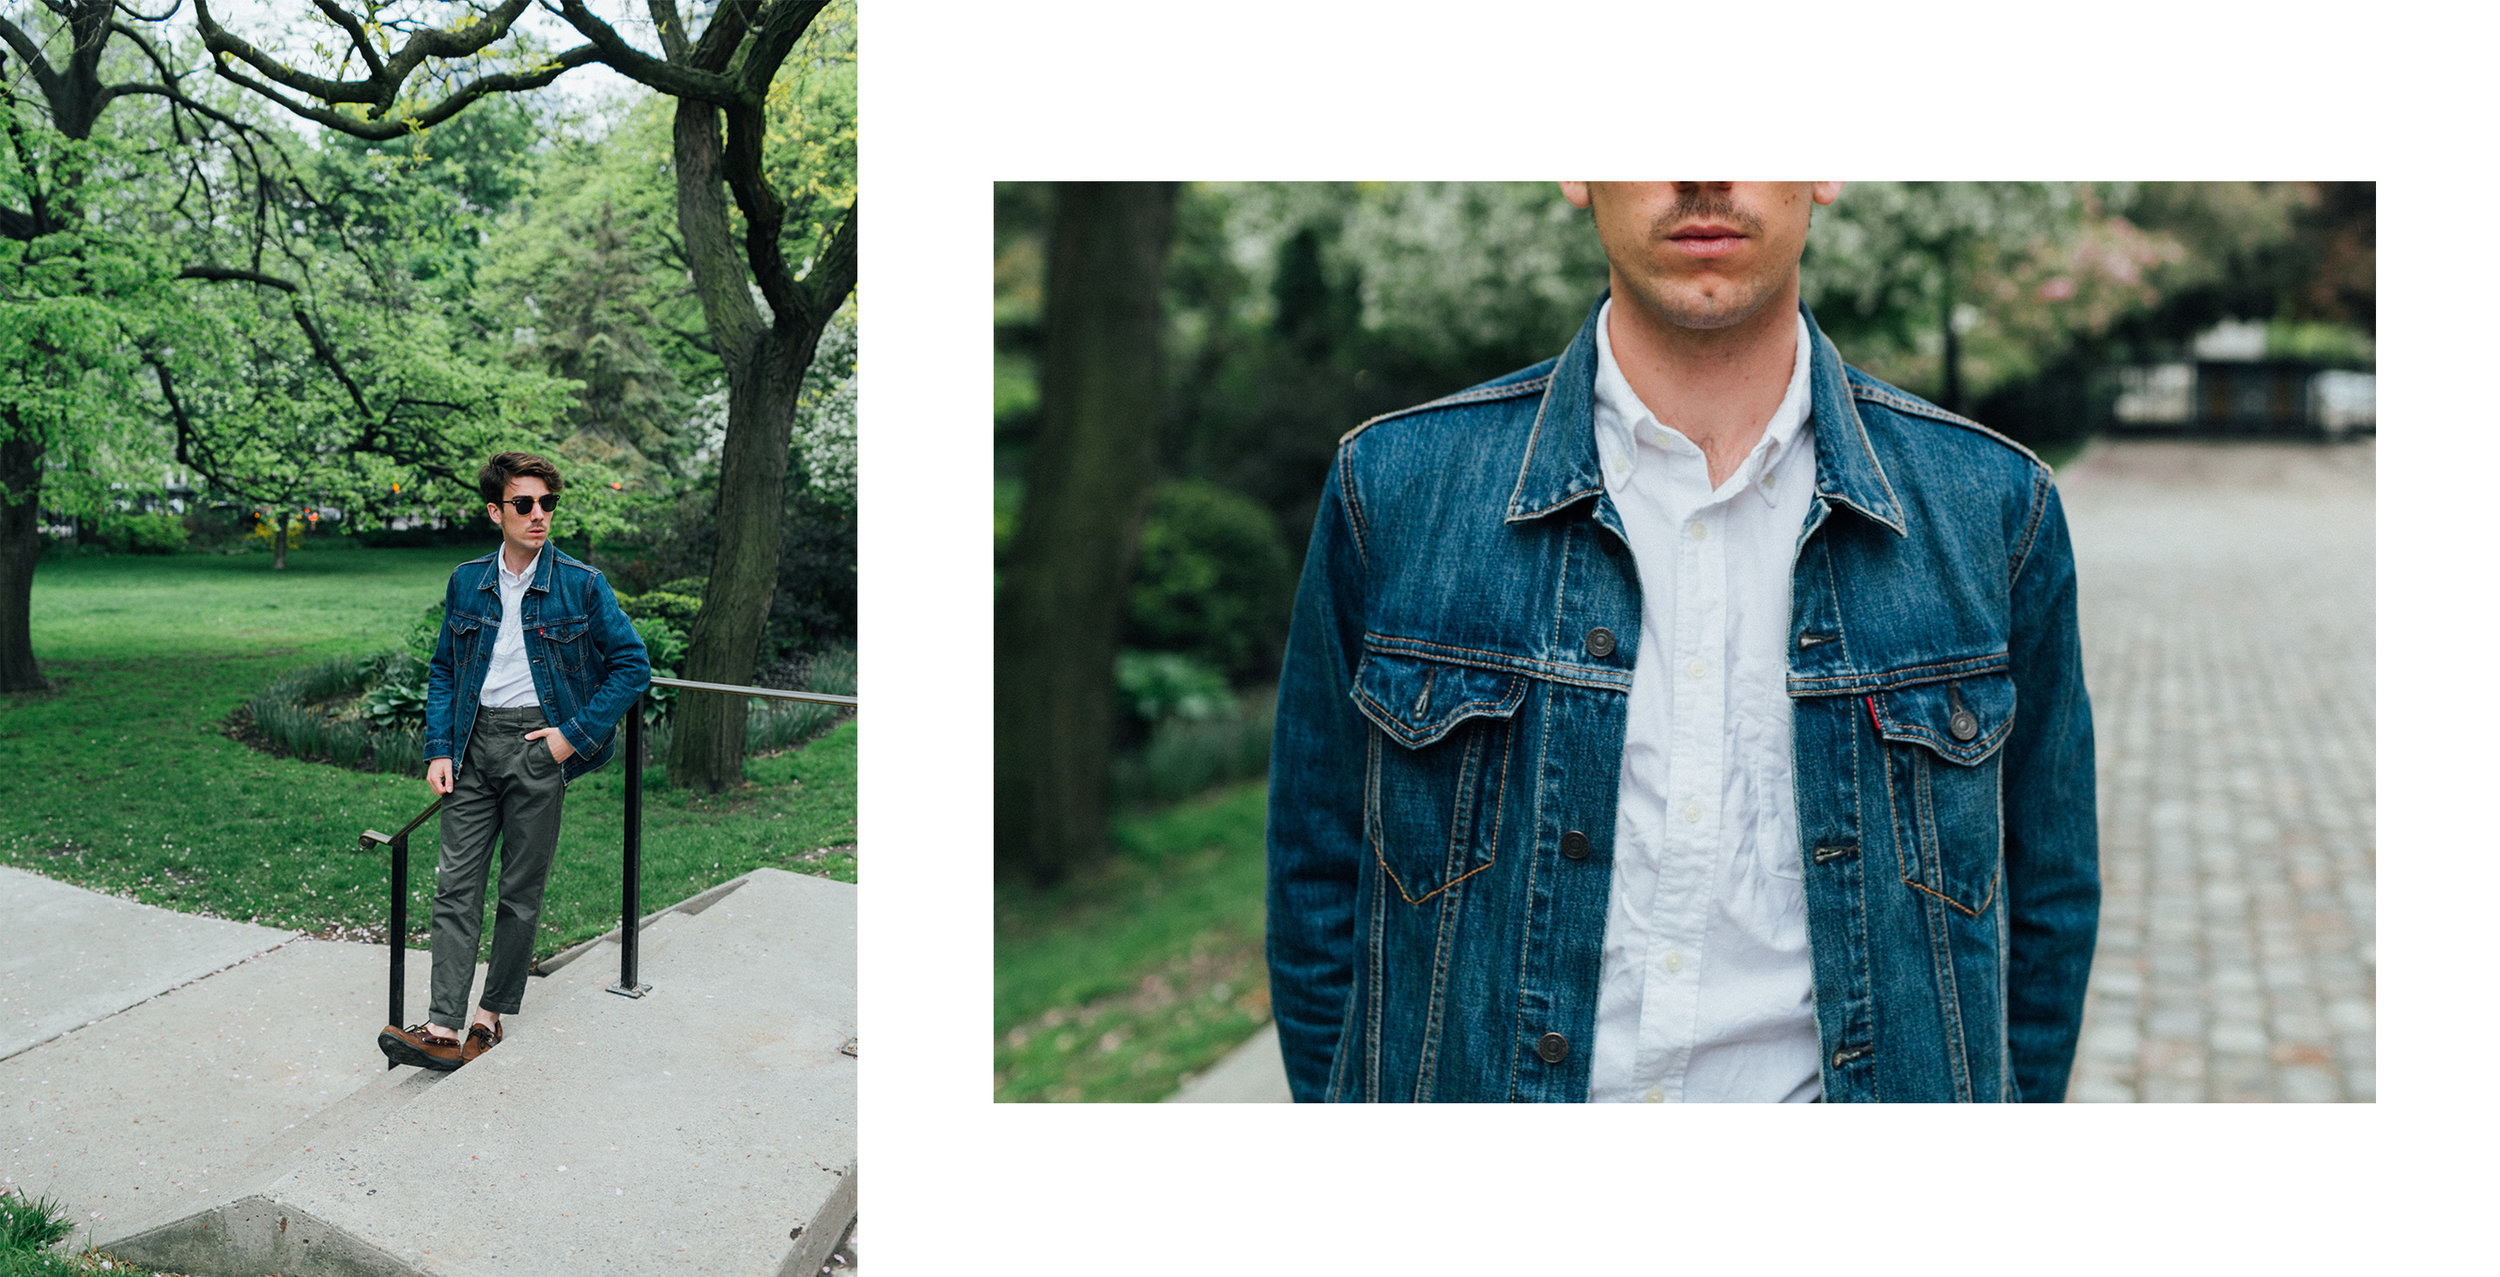 Sean-Pollock-Denim-Jacket-.jpg